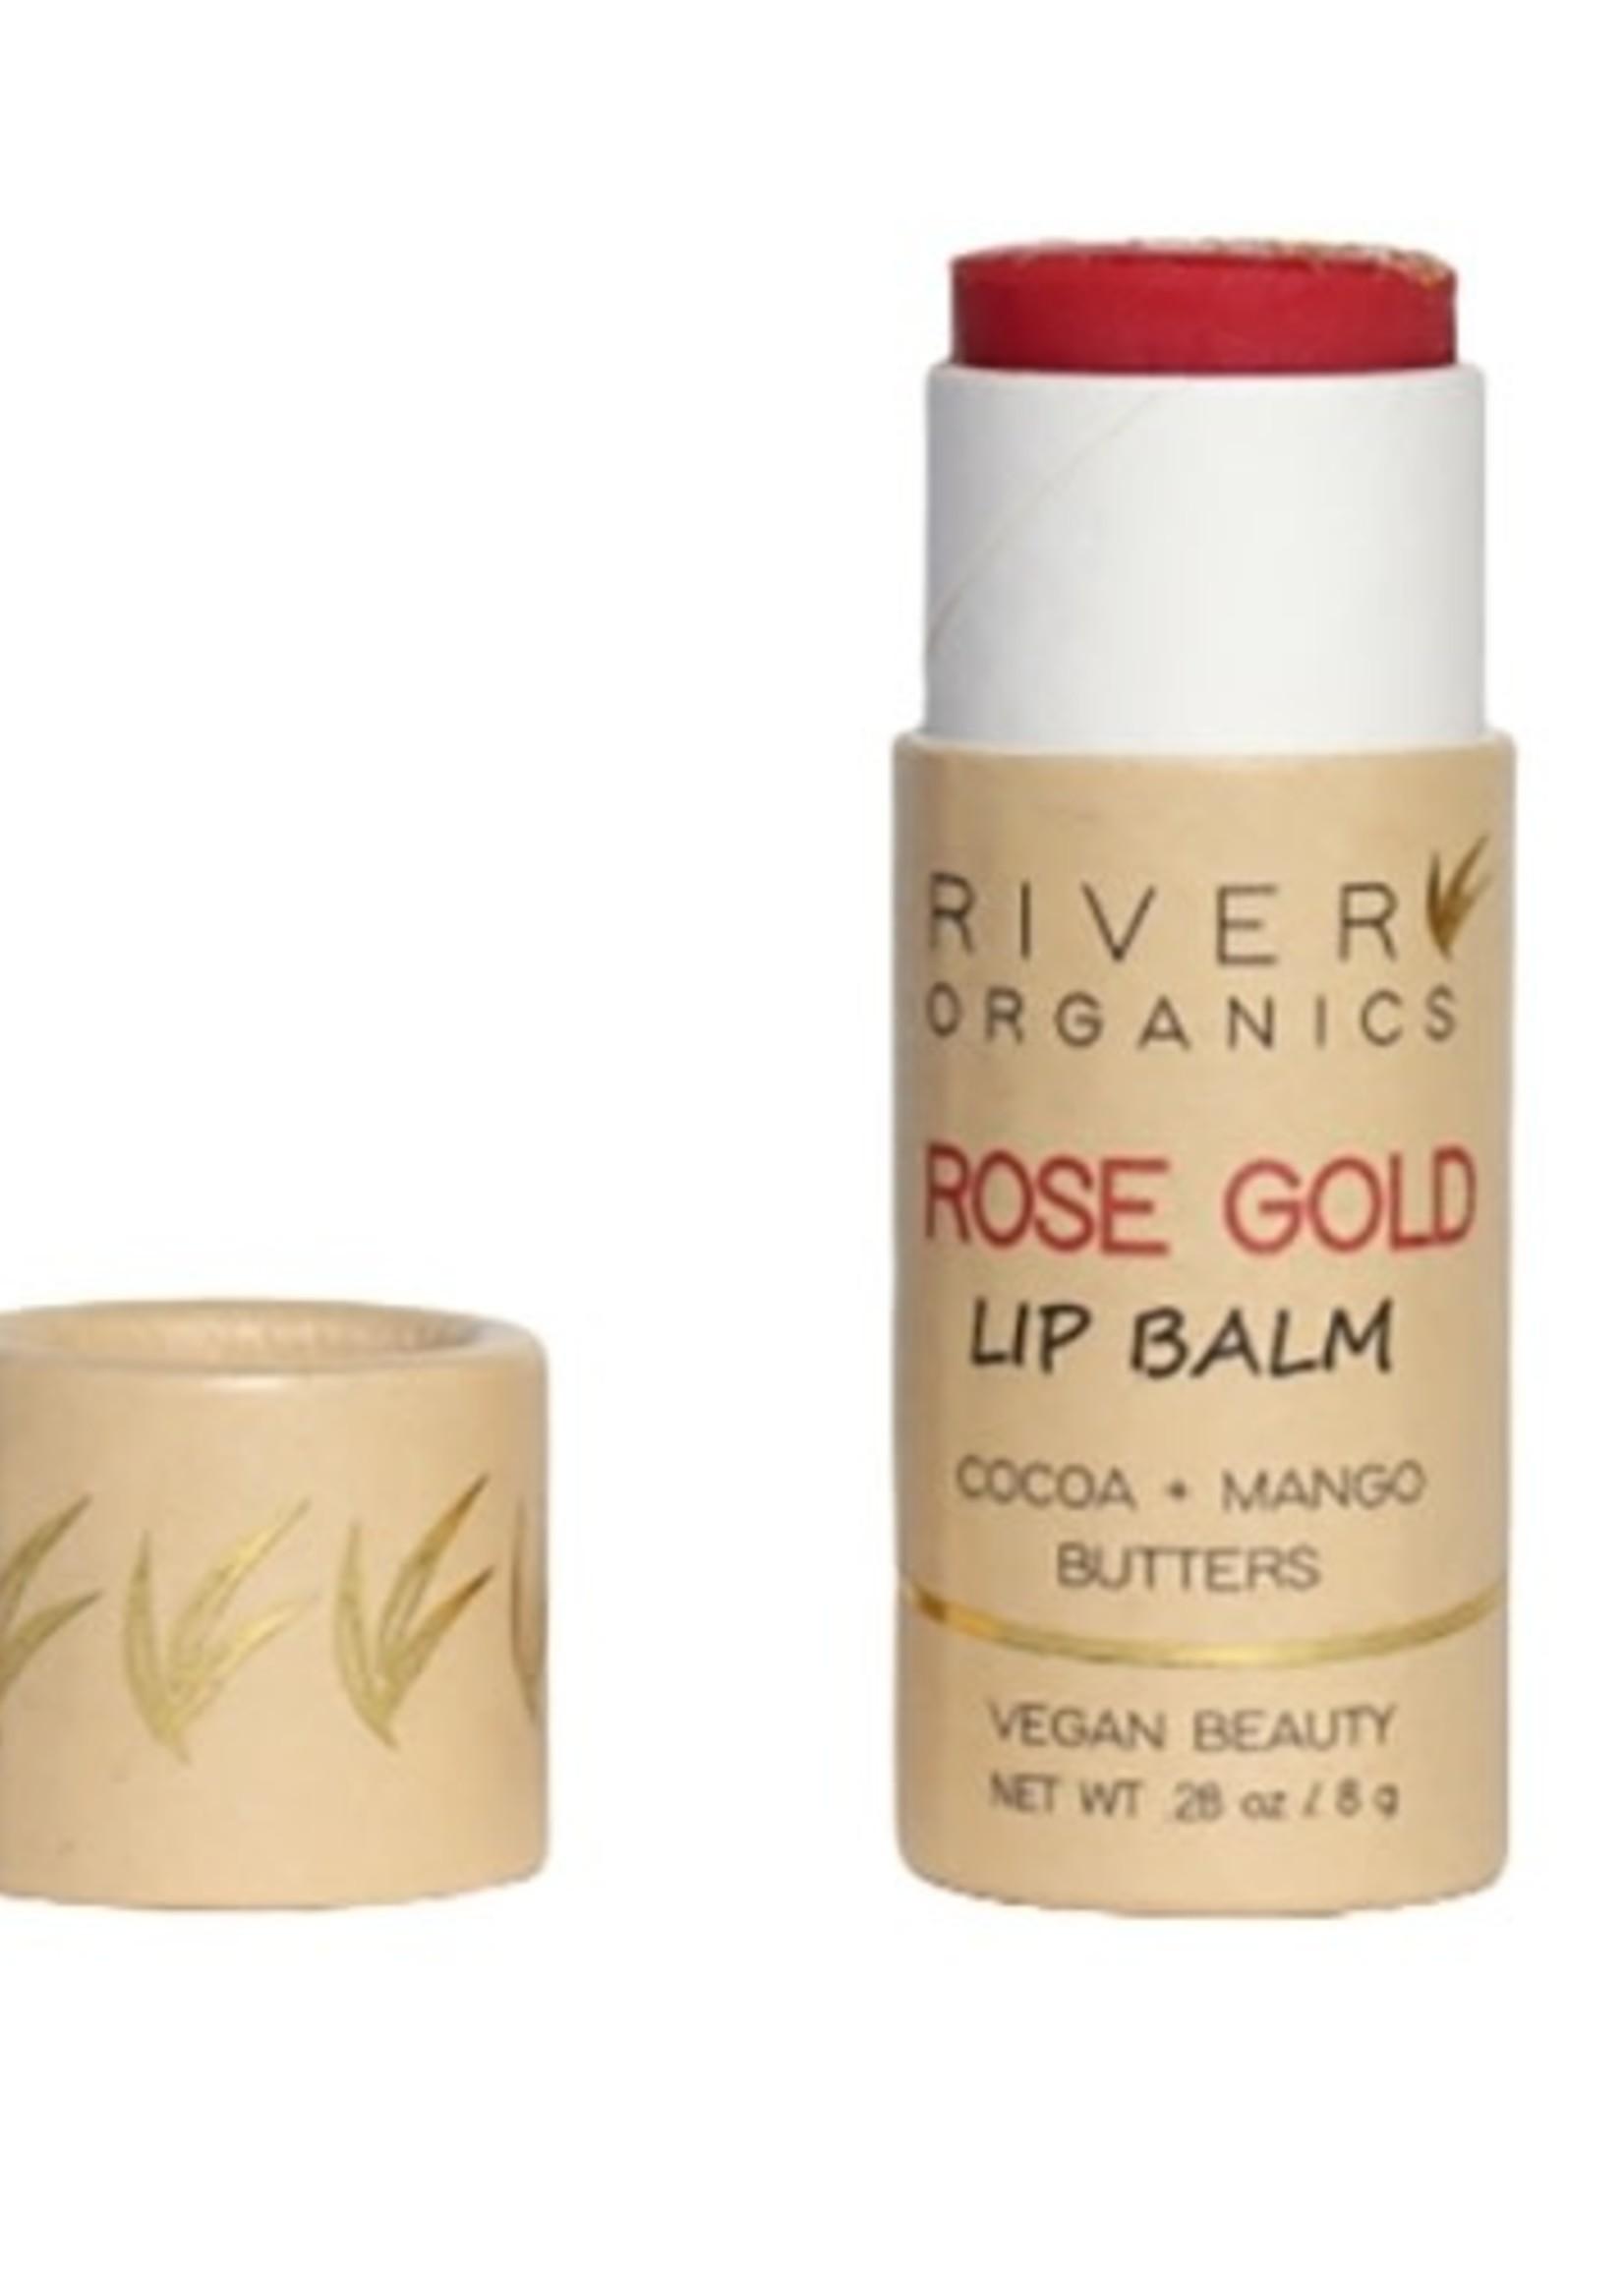 River Organics Rose Gold Lip Balm